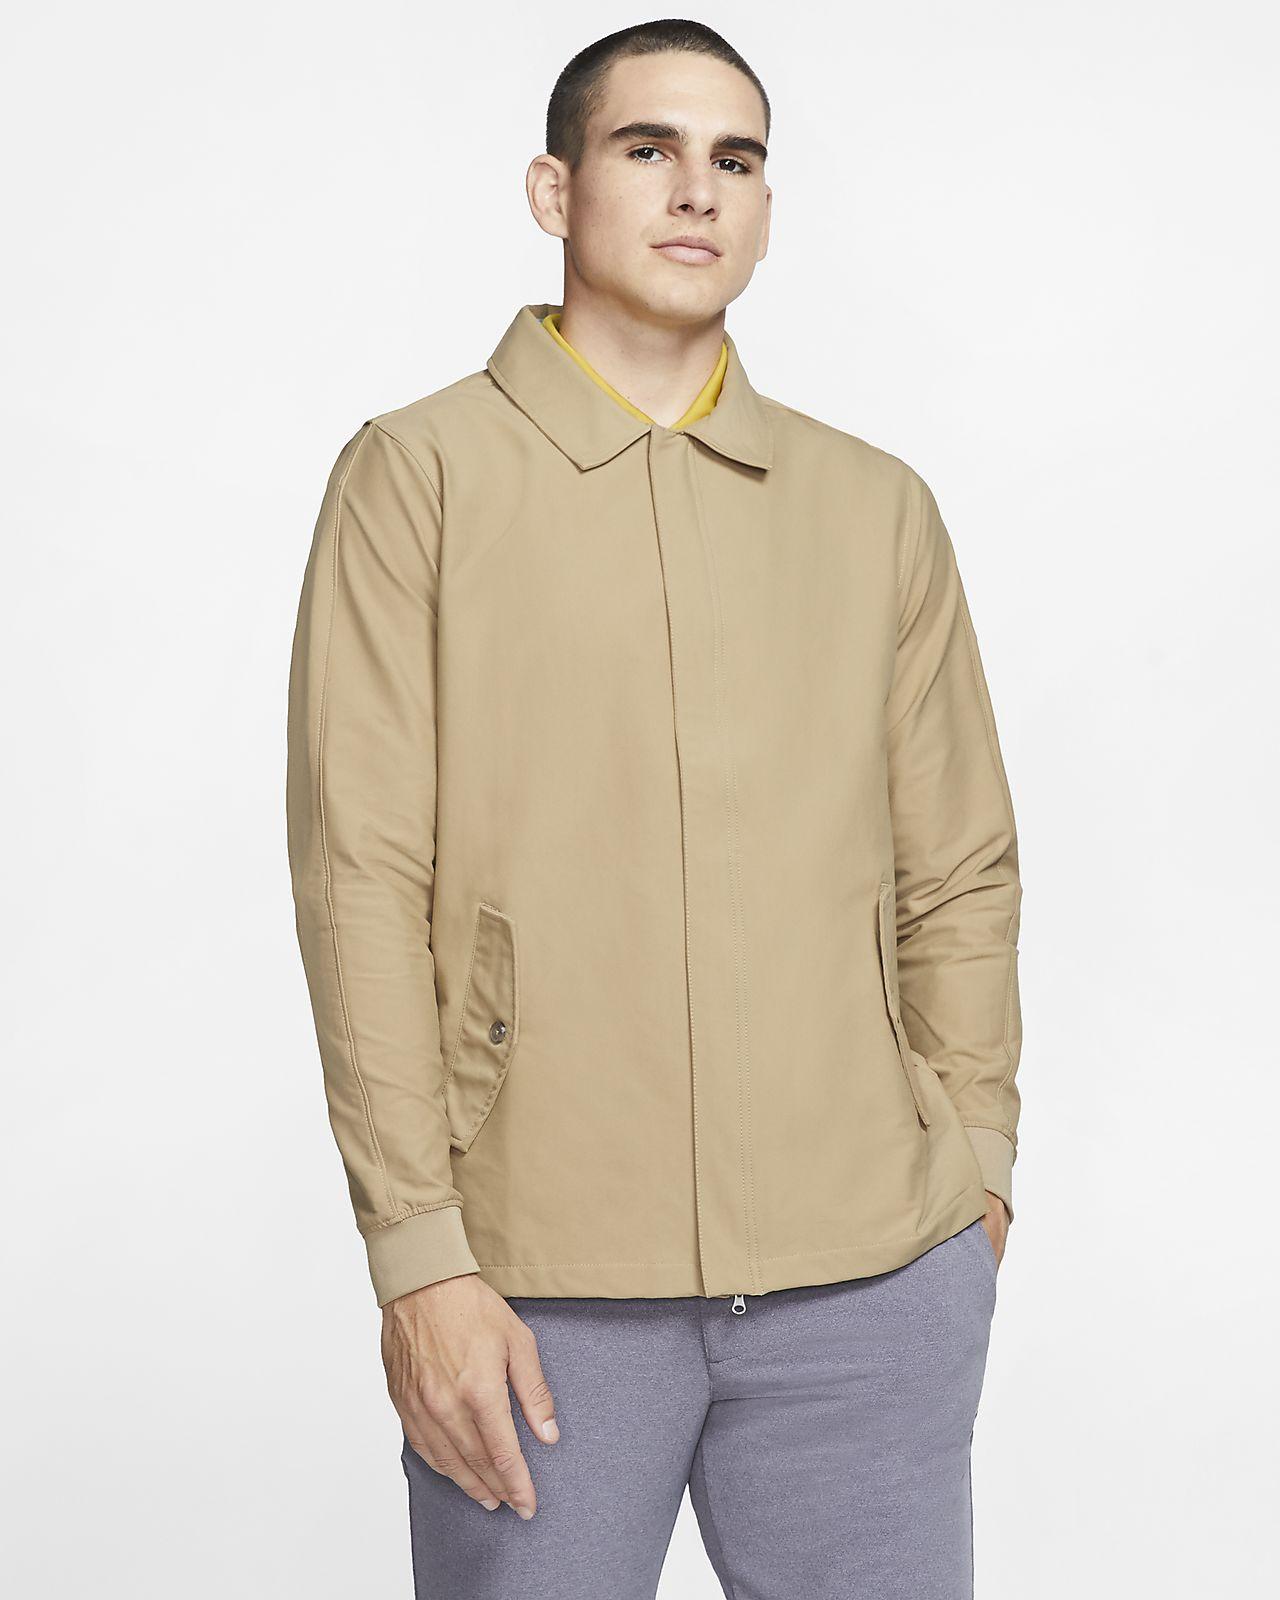 Nike Repel Player Men's Golf Jacket